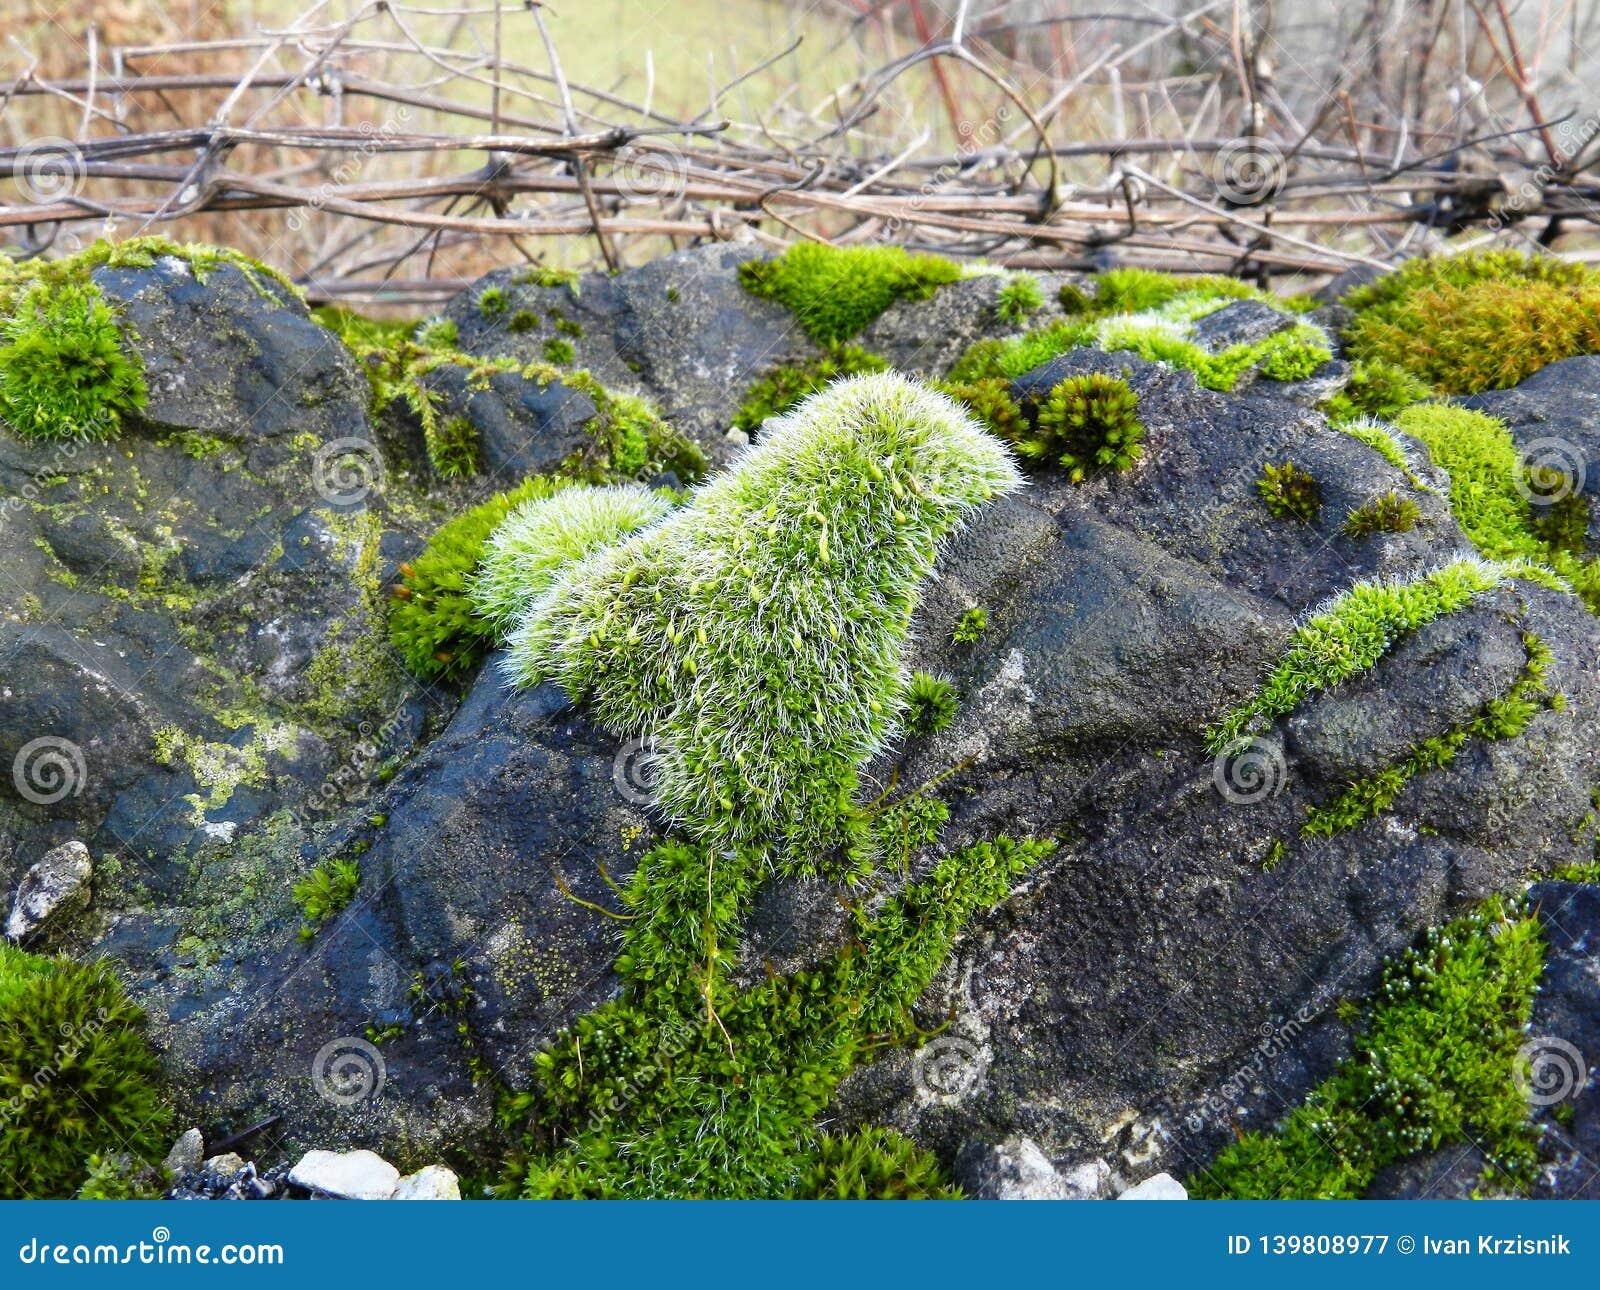 Åebrelje斯洛文尼亚发现了穴居人的长笛